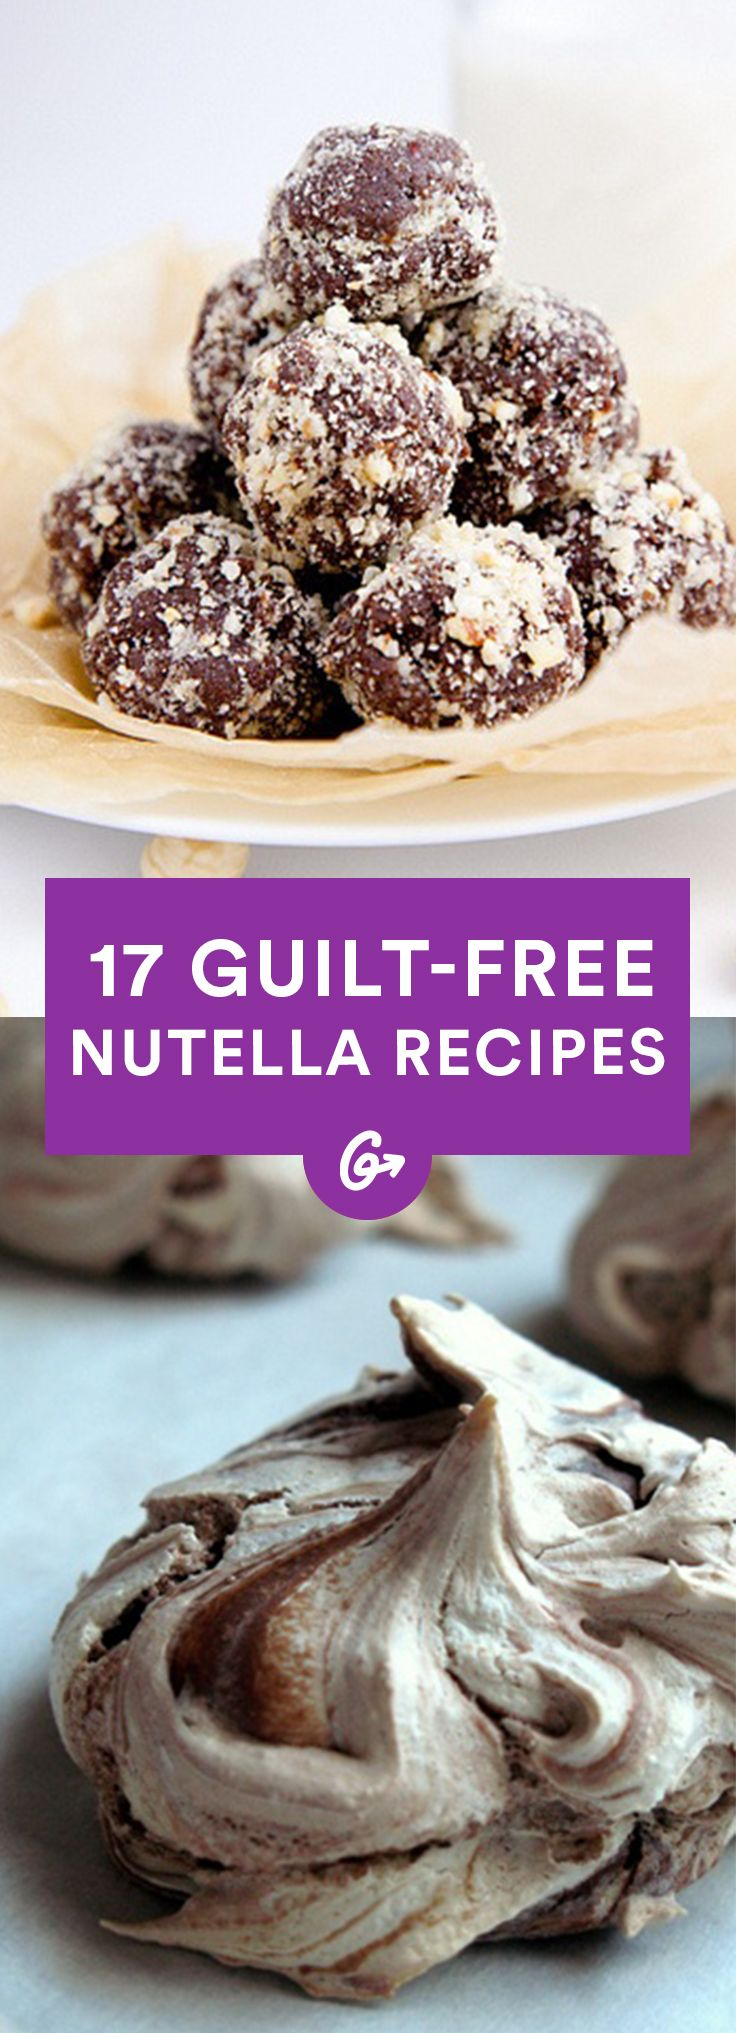 *Drools* #nutella #desserts http://greatist.com/health/healthy-nutella-recipes